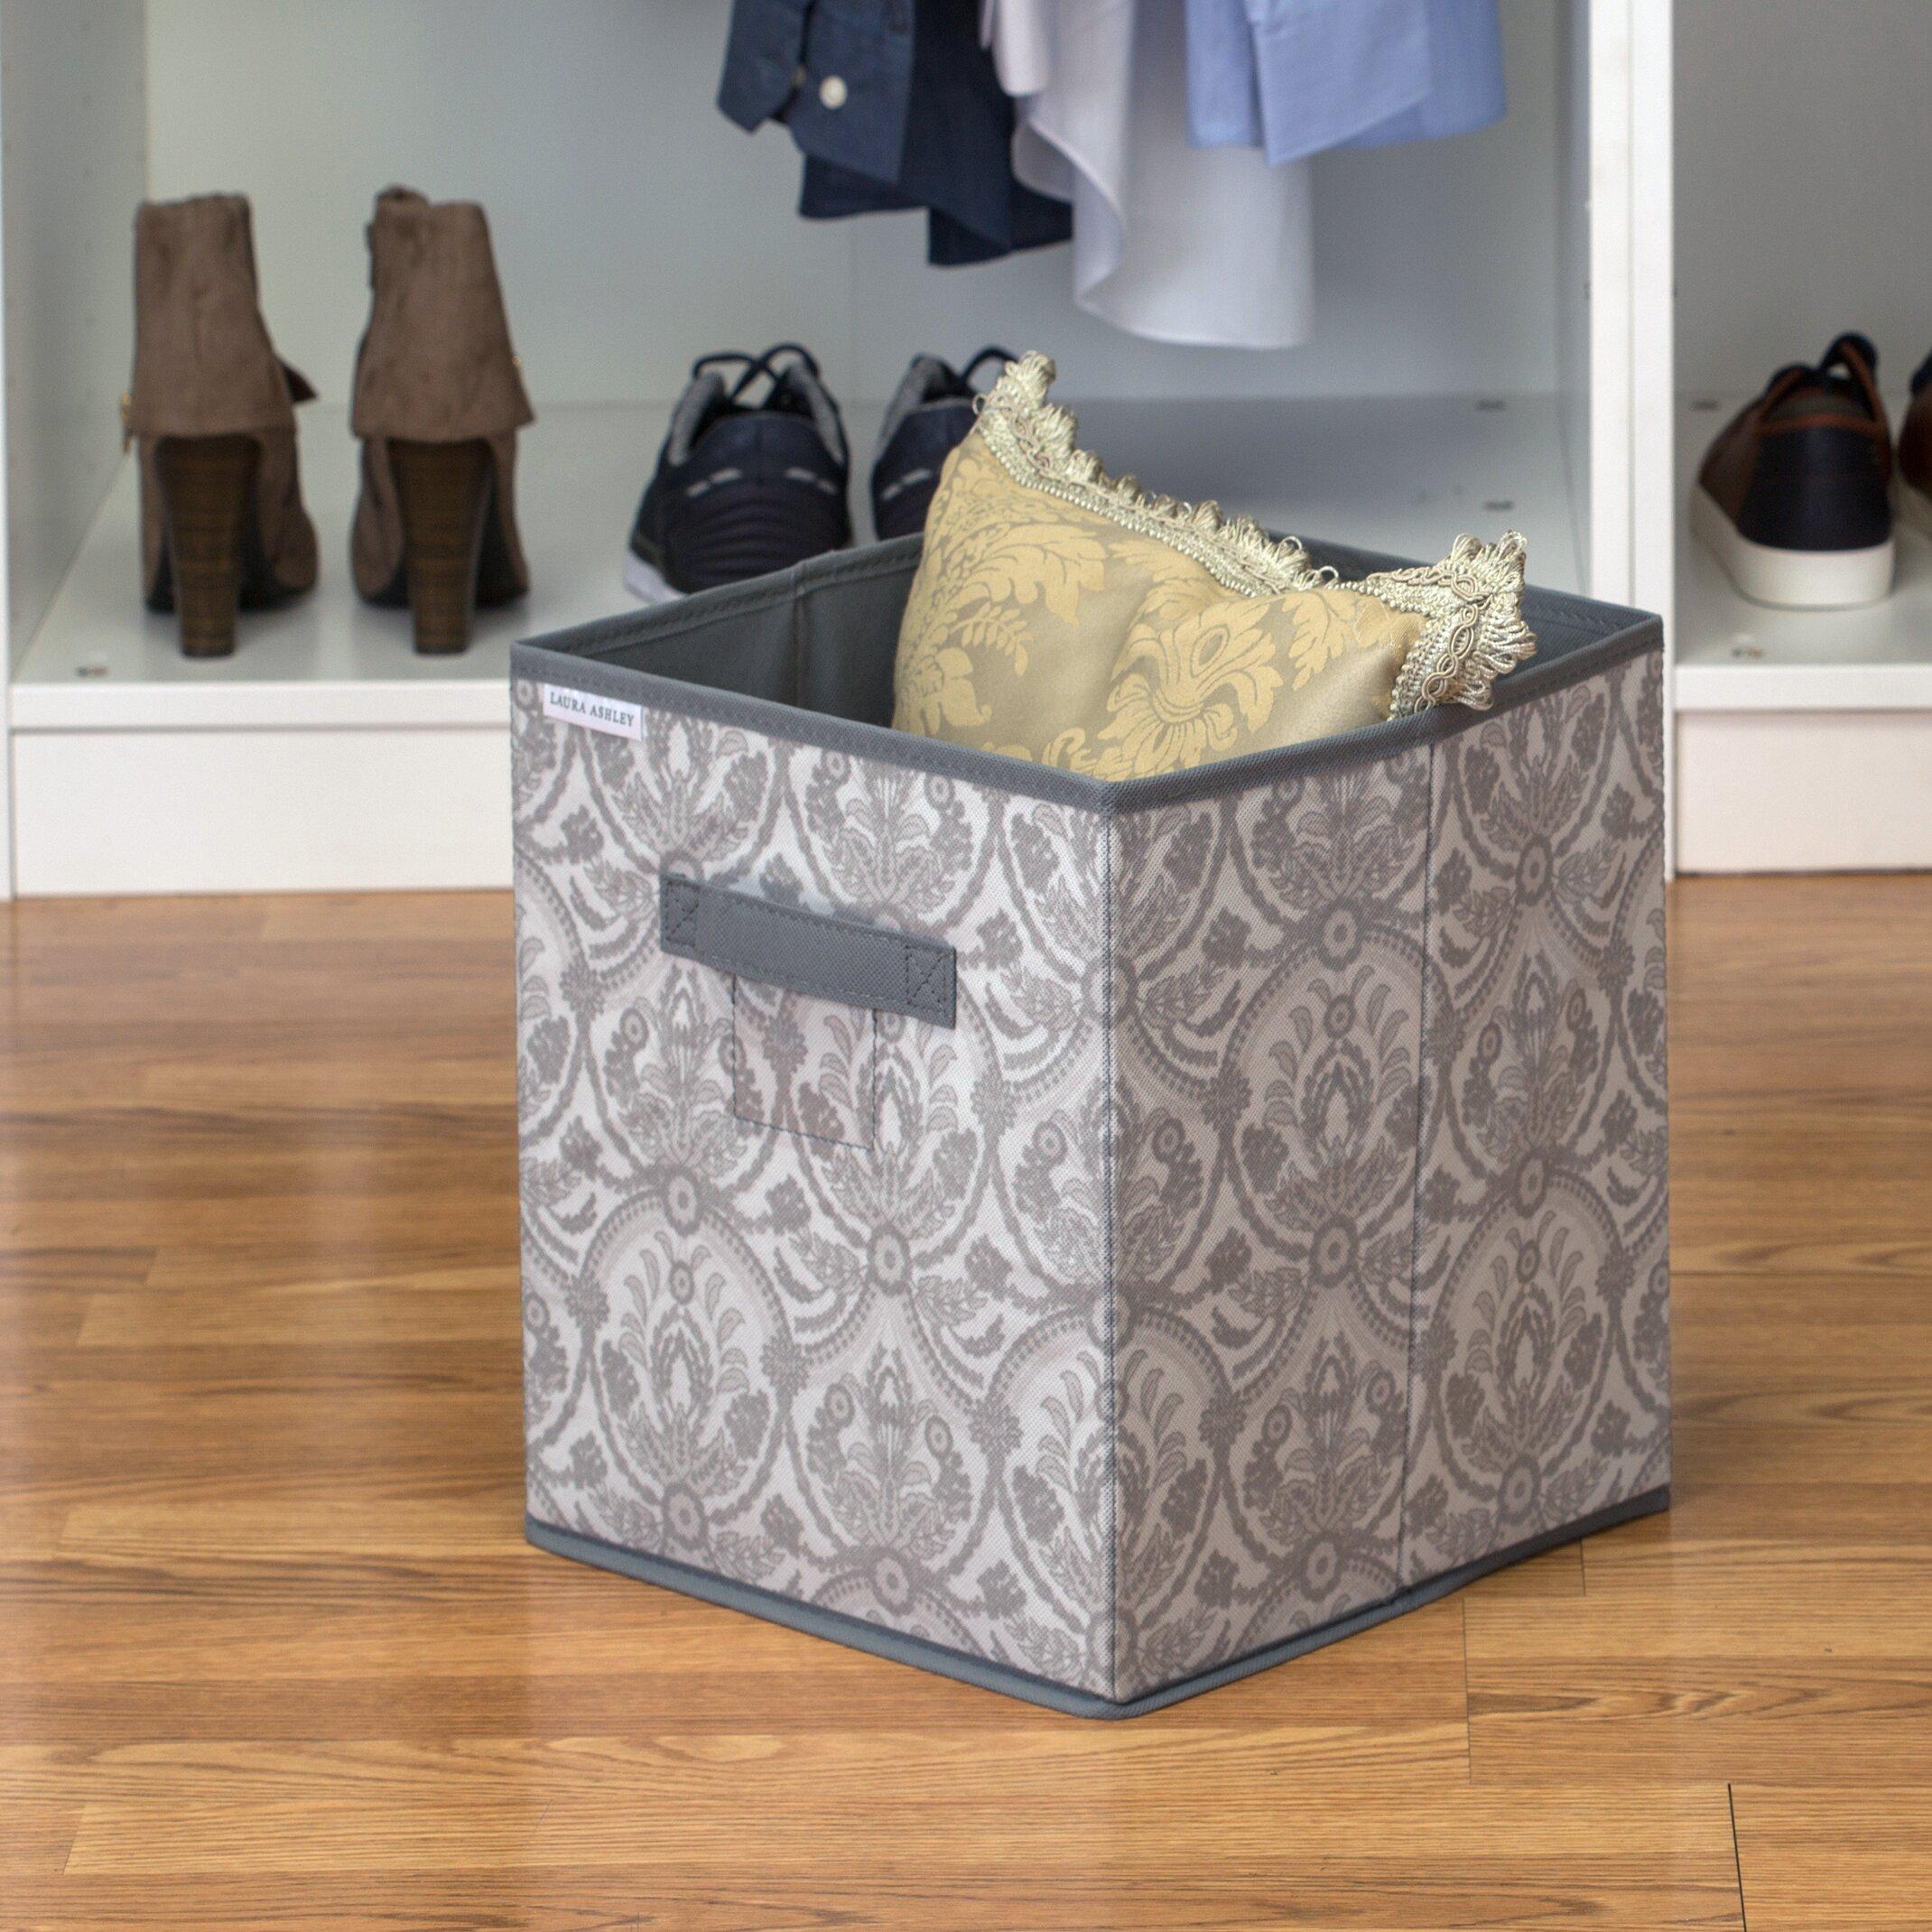 Laura Ashley Bedroom Chairs Maisie Storage Bin By Laura Ashley Reviews Joss Main